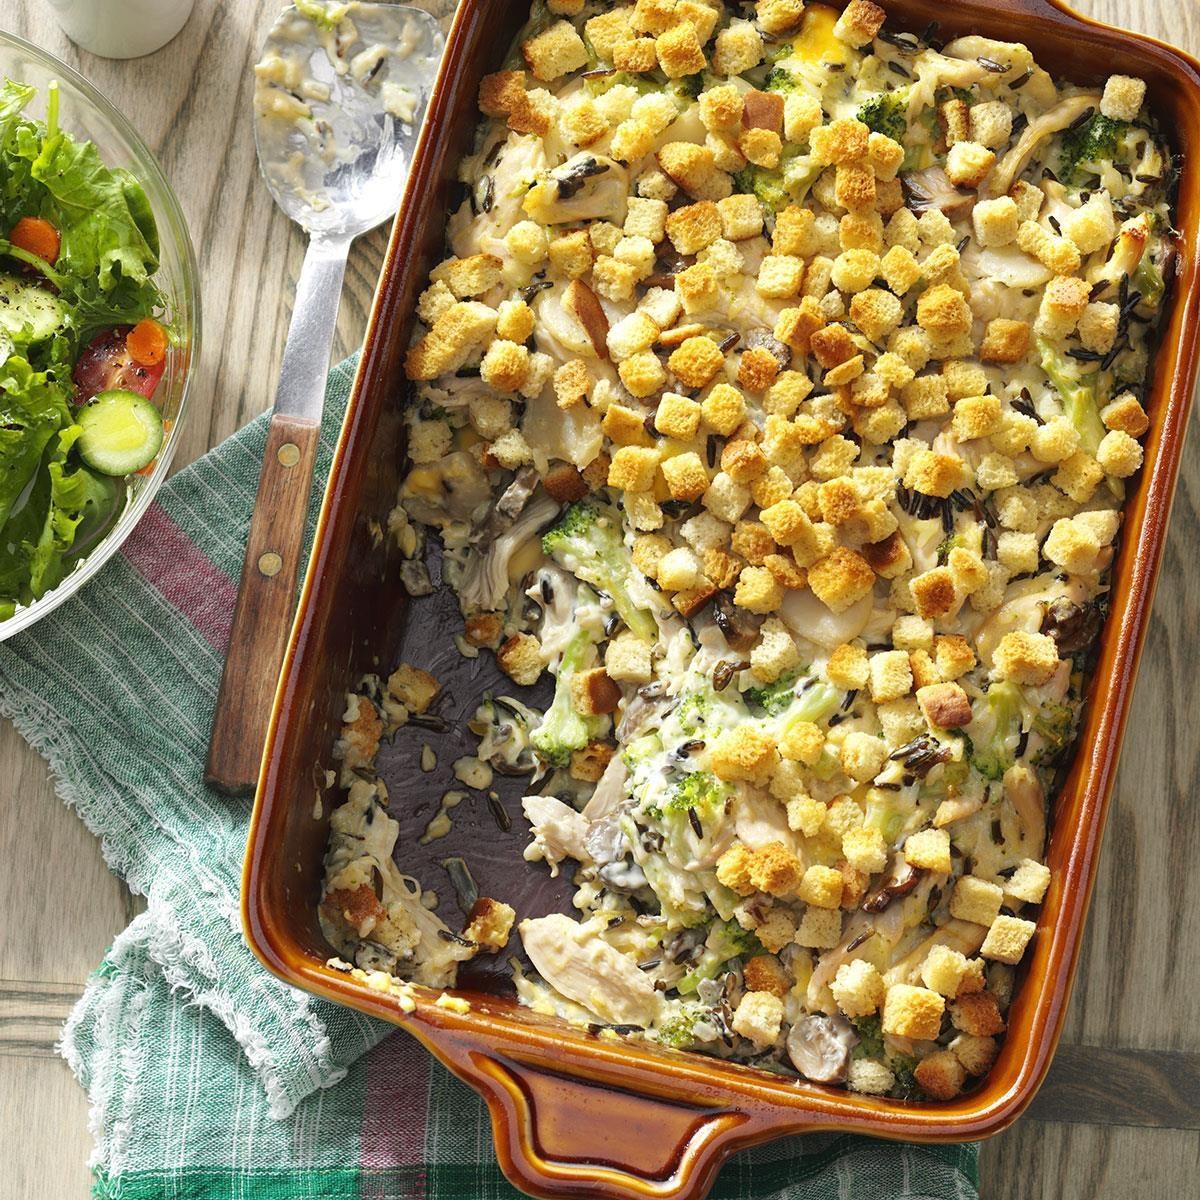 Creamy Turkey Casserole Recipe